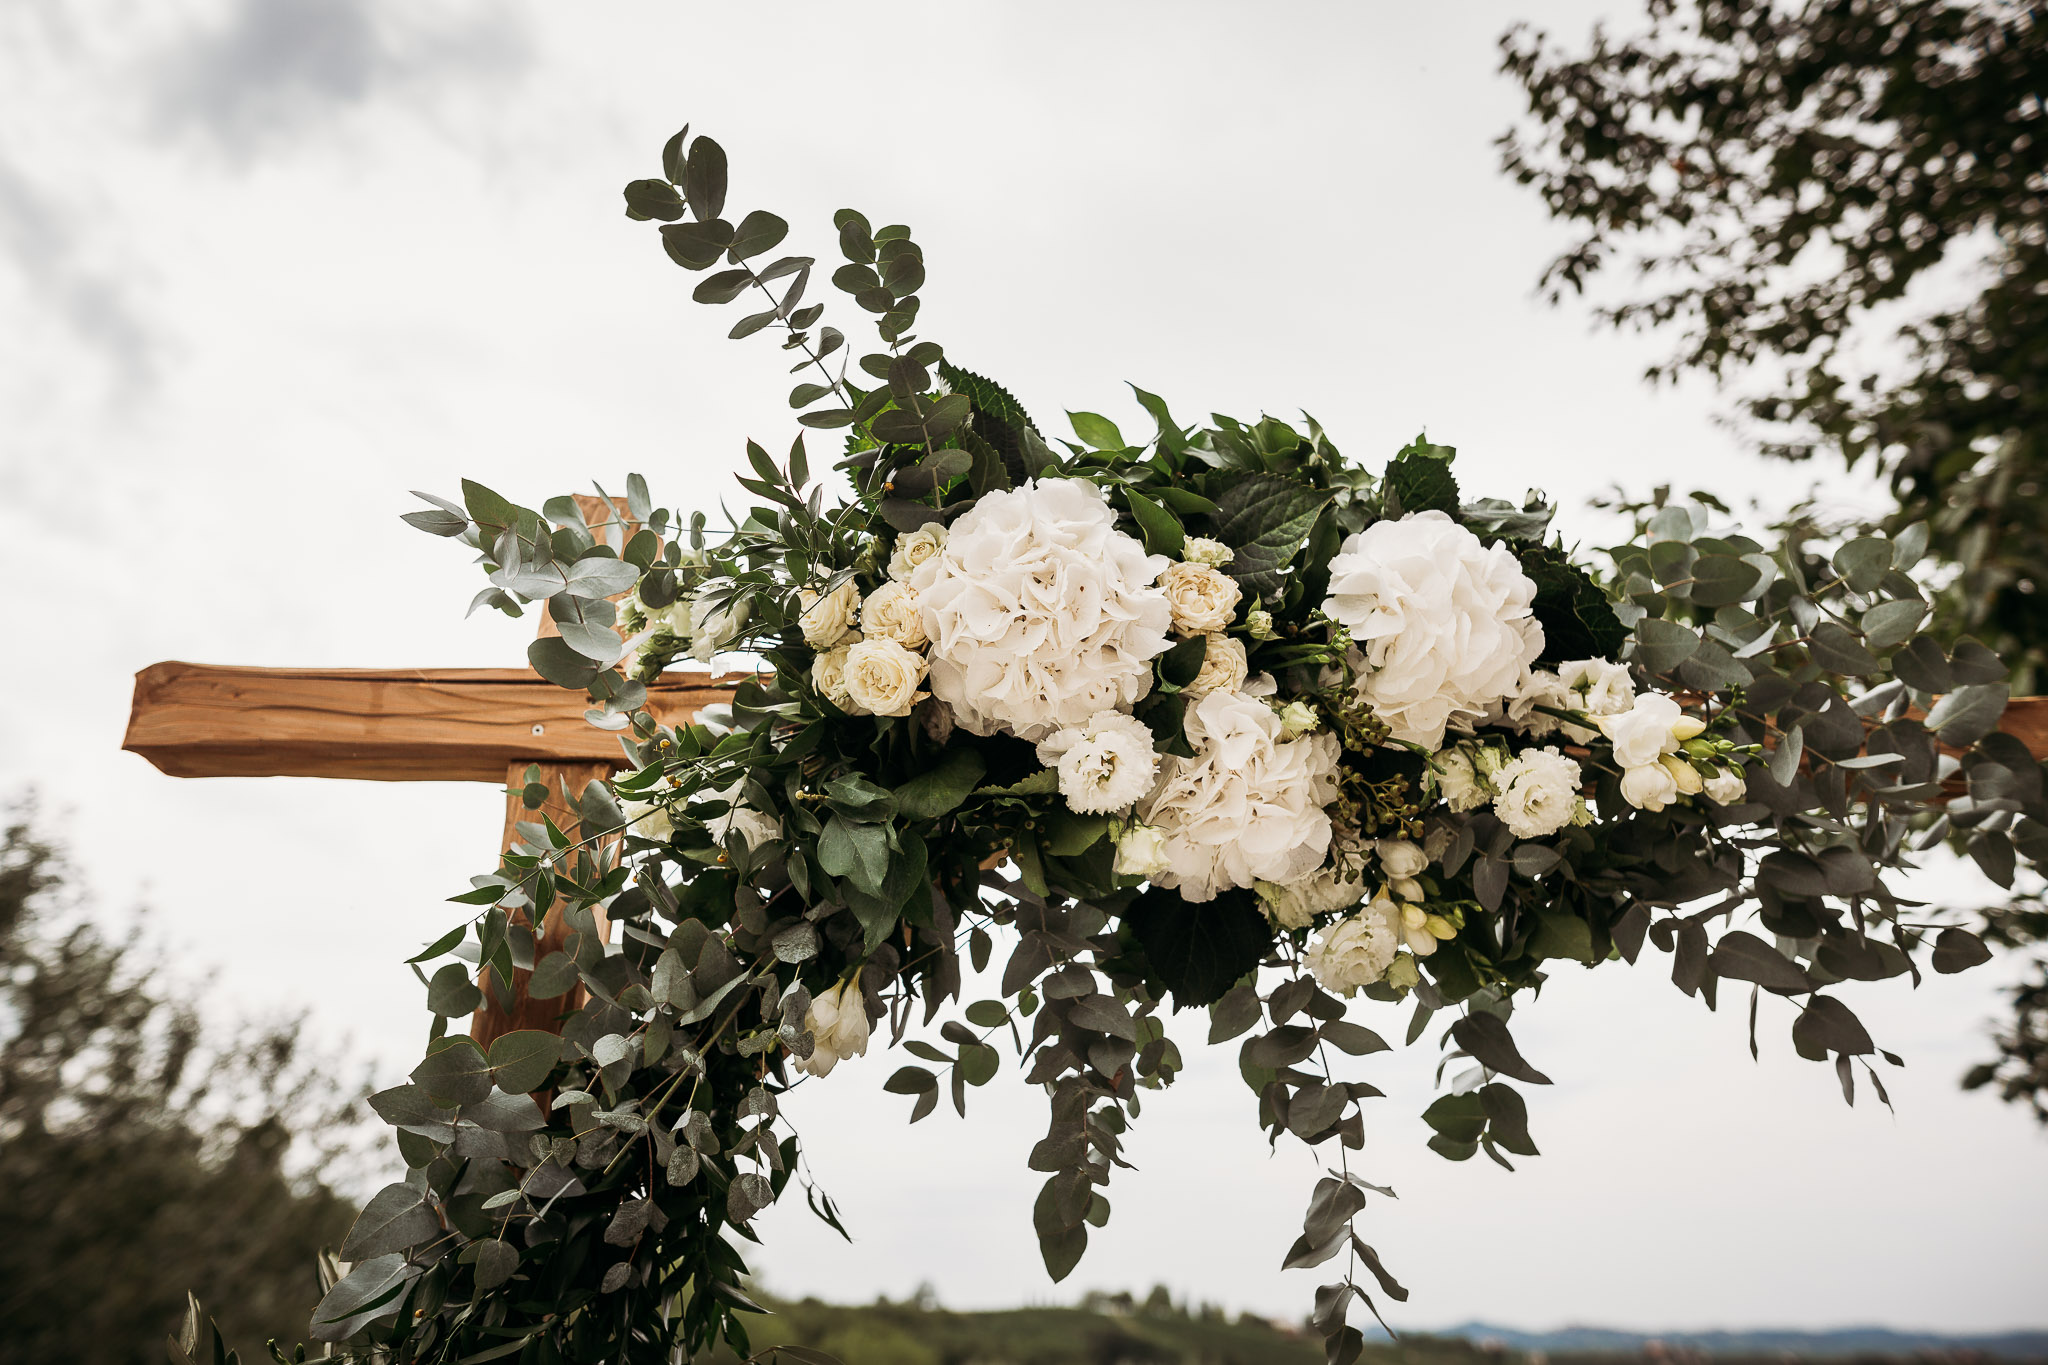 White carnation, olive and eucalyptus leaves wedding decor at La Villa Hotel, Mombaruzzo